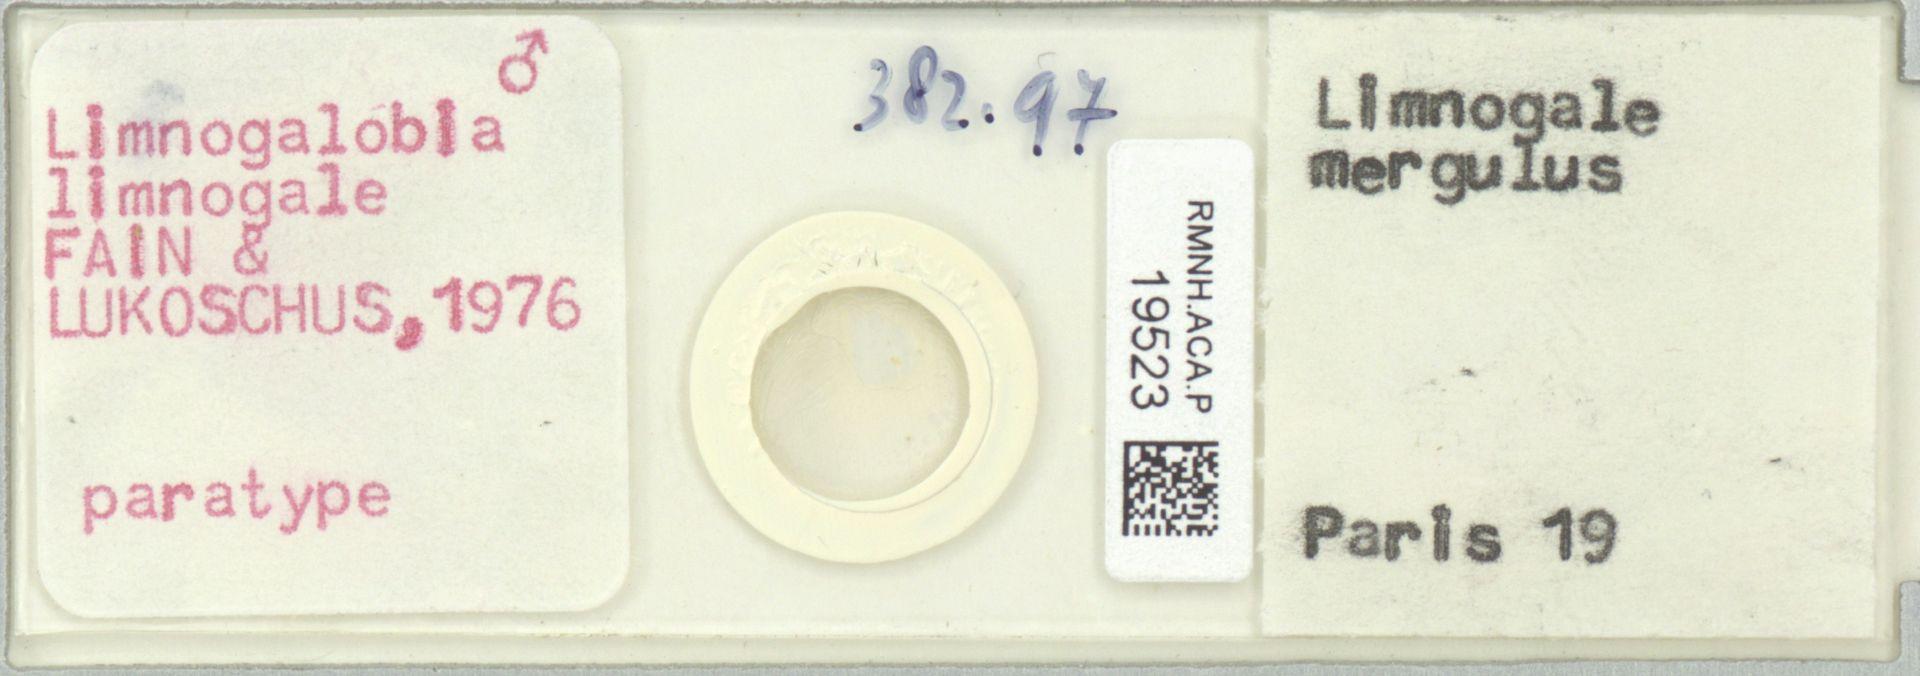 RMNH.ACA.P.19523 | Limnogalobia limnogale